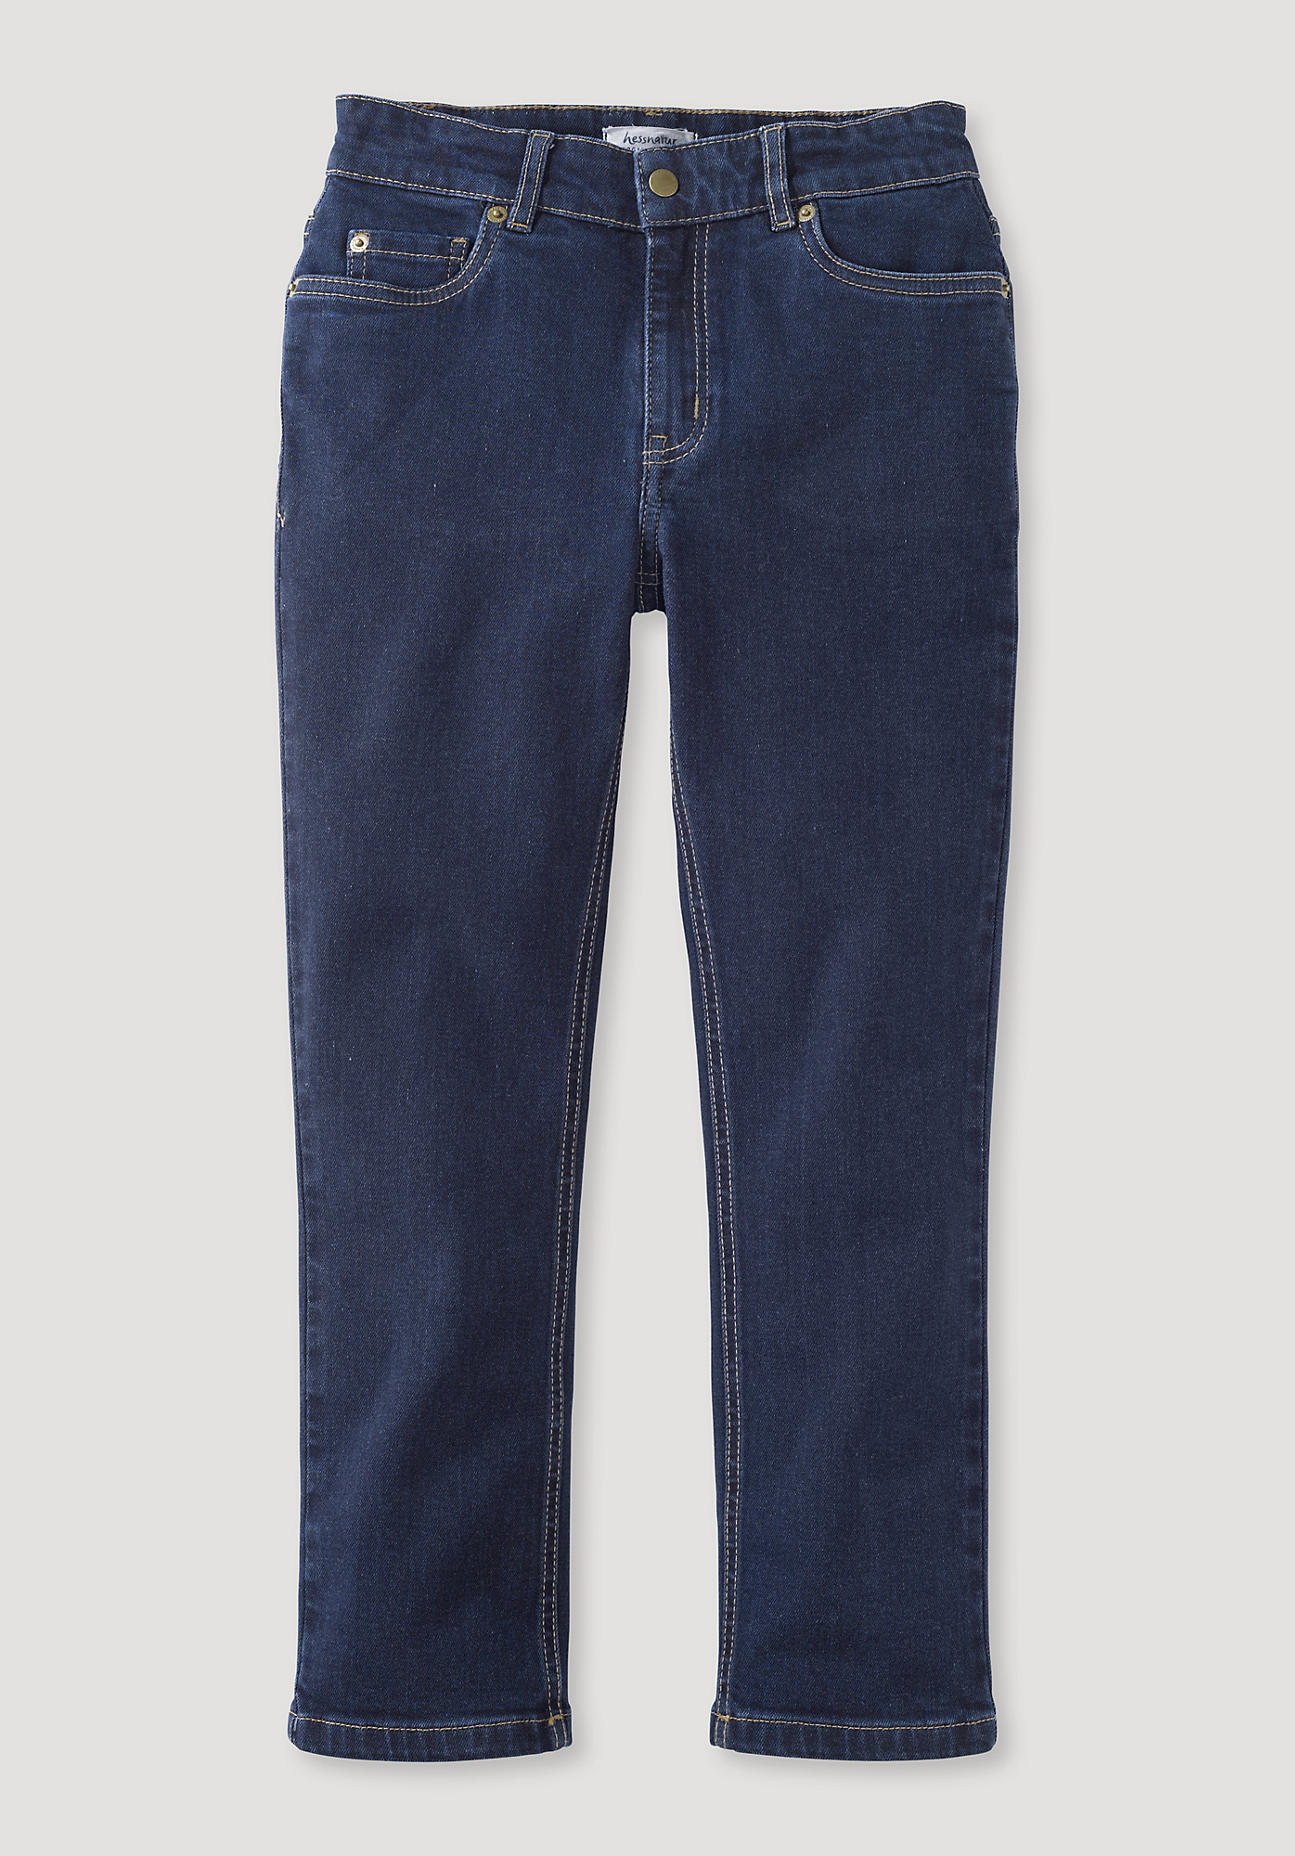 hessnatur Kinder 5-Pocket-Jeans Betterecycling aus Bio-Baumwolle - blau Größe 134